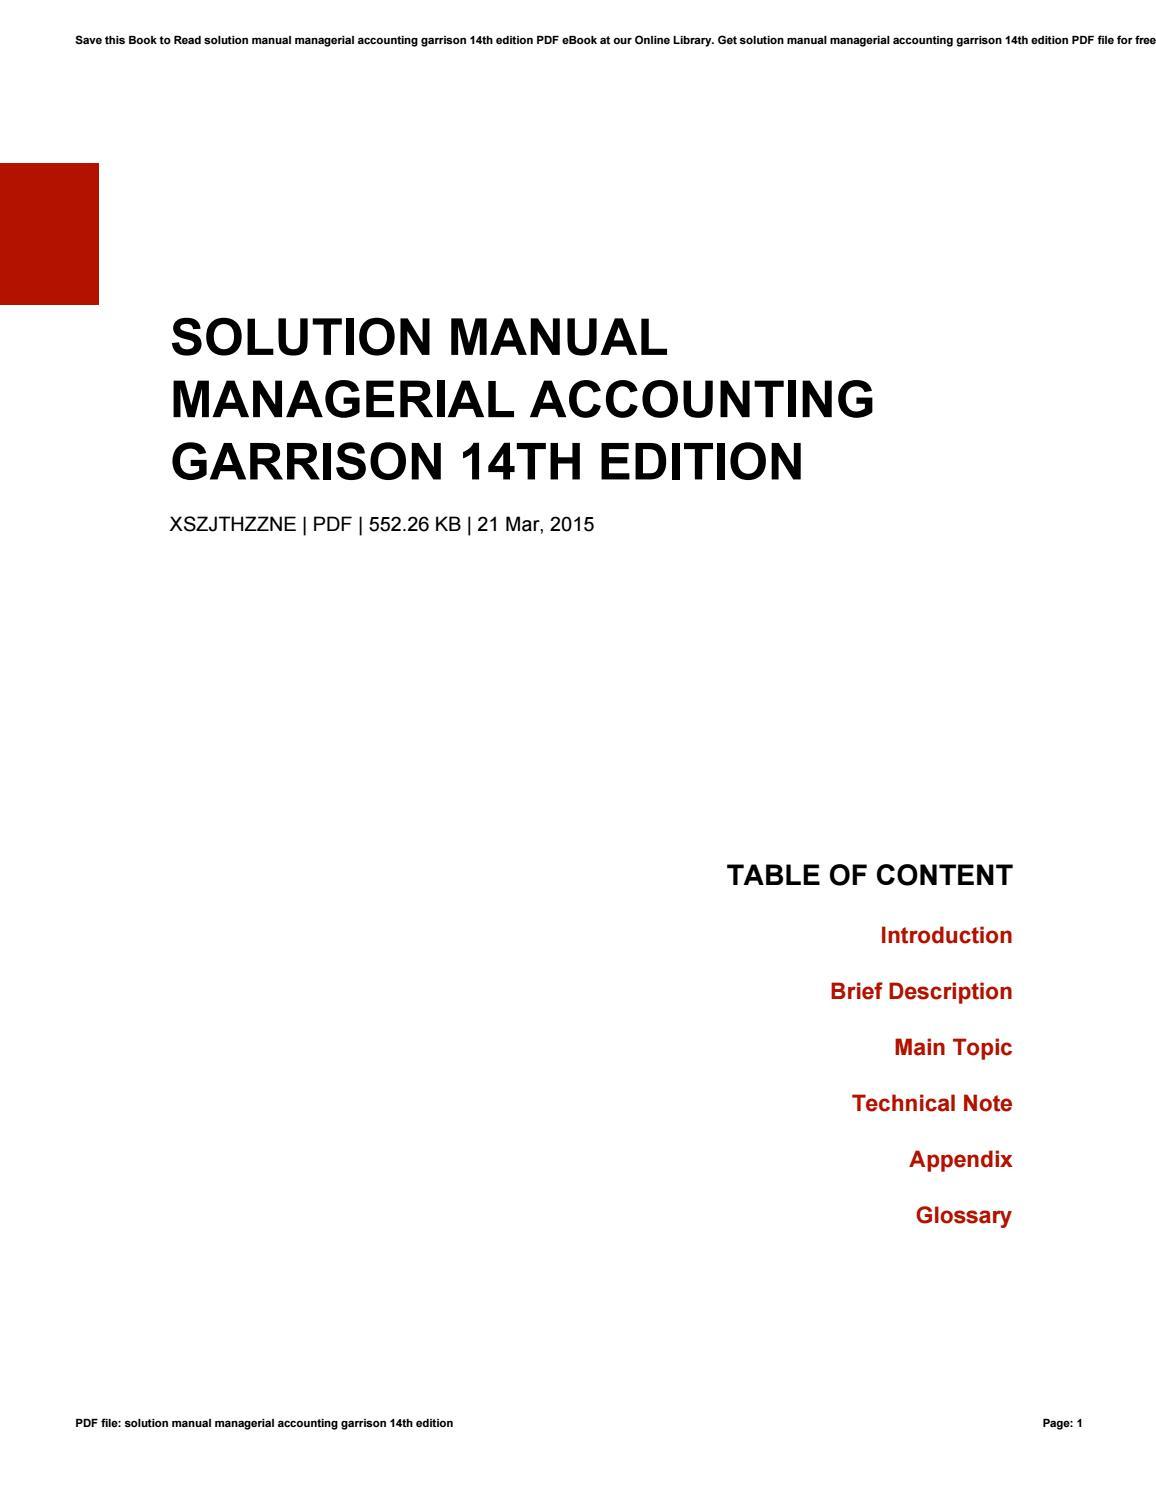 Solution Manual Managerial Accounting Garrison 14th Edition By Billzamarripa4728 Issuu